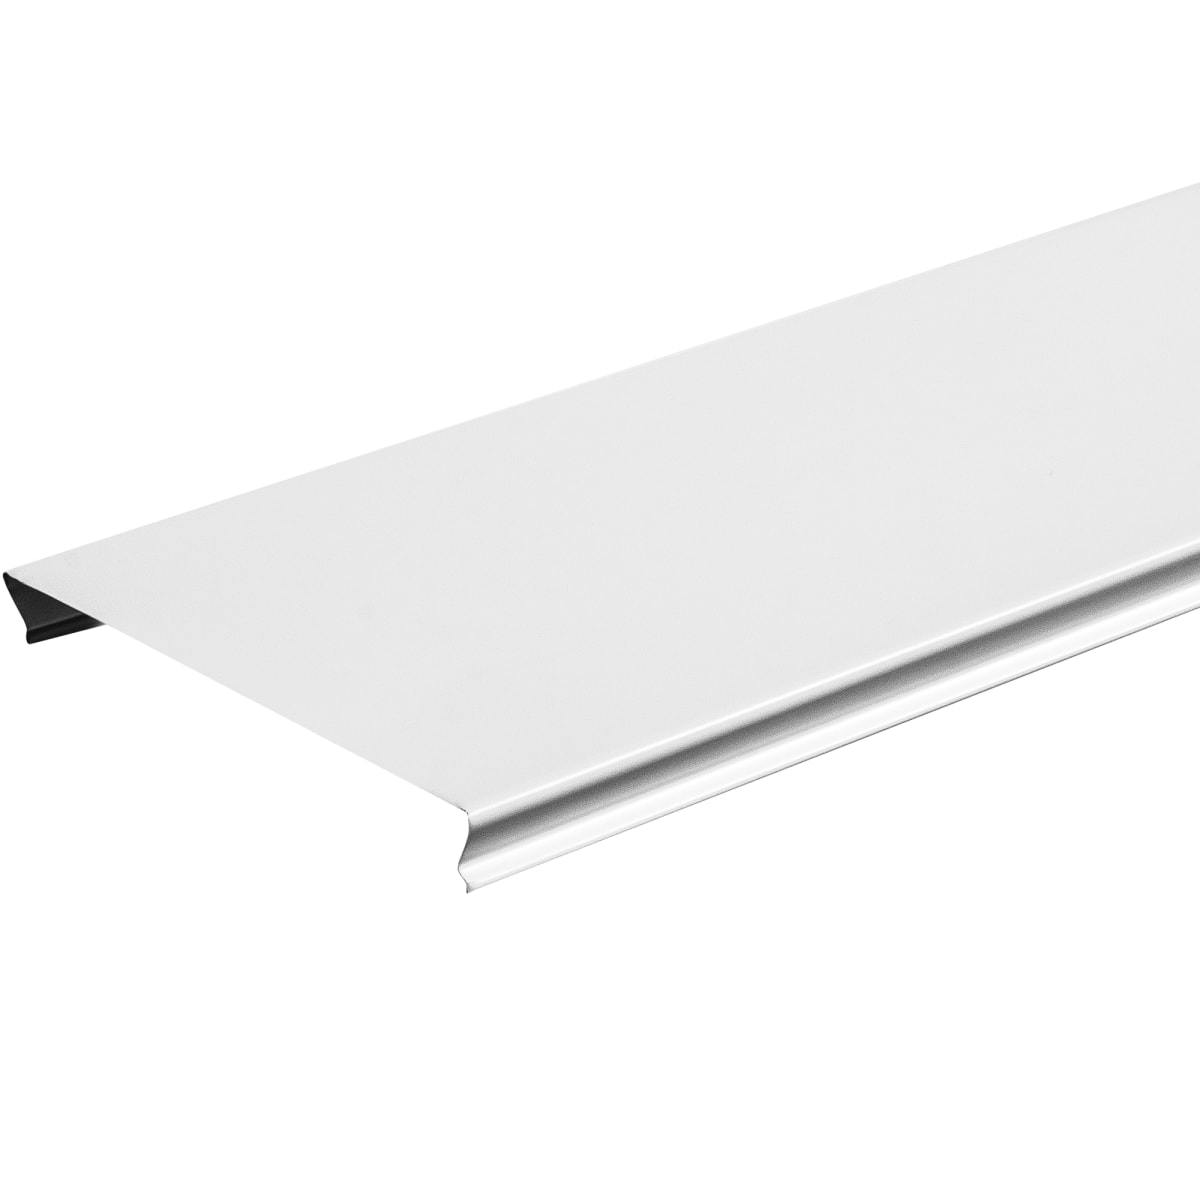 Набор реек Artens 2.5х1.05 м цвет белый матовый